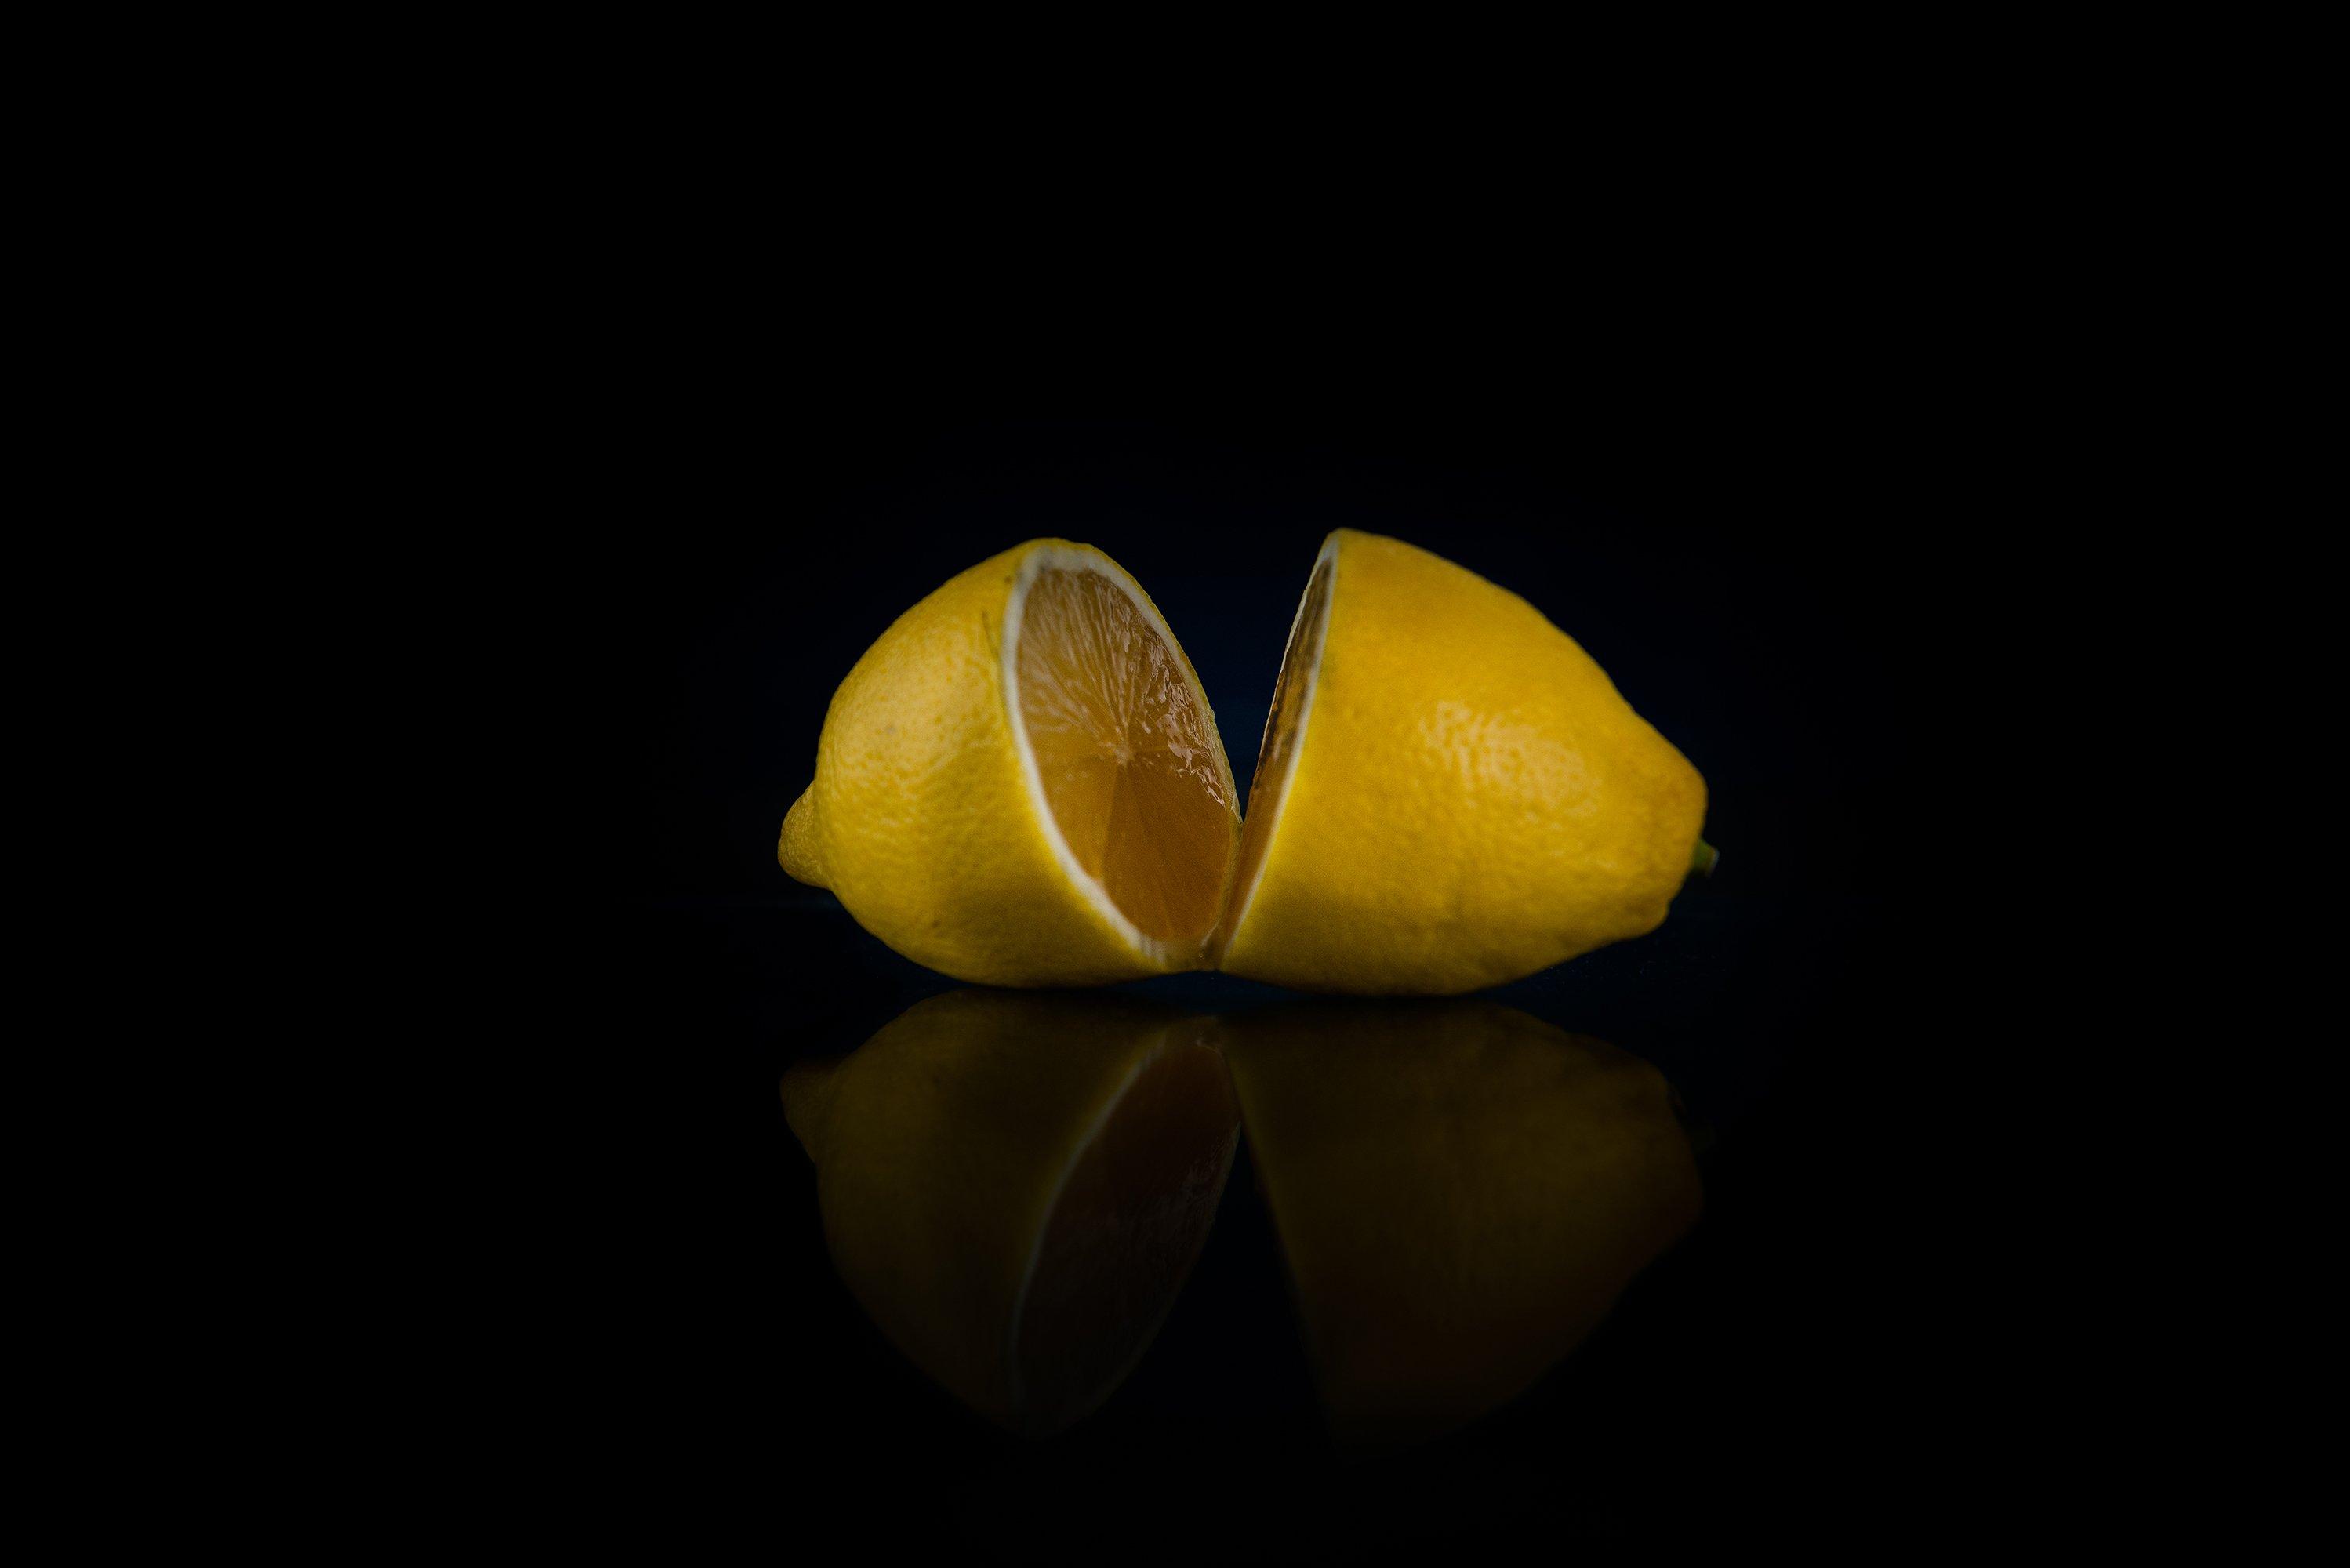 two halves of whole lemon on a black background example image 1